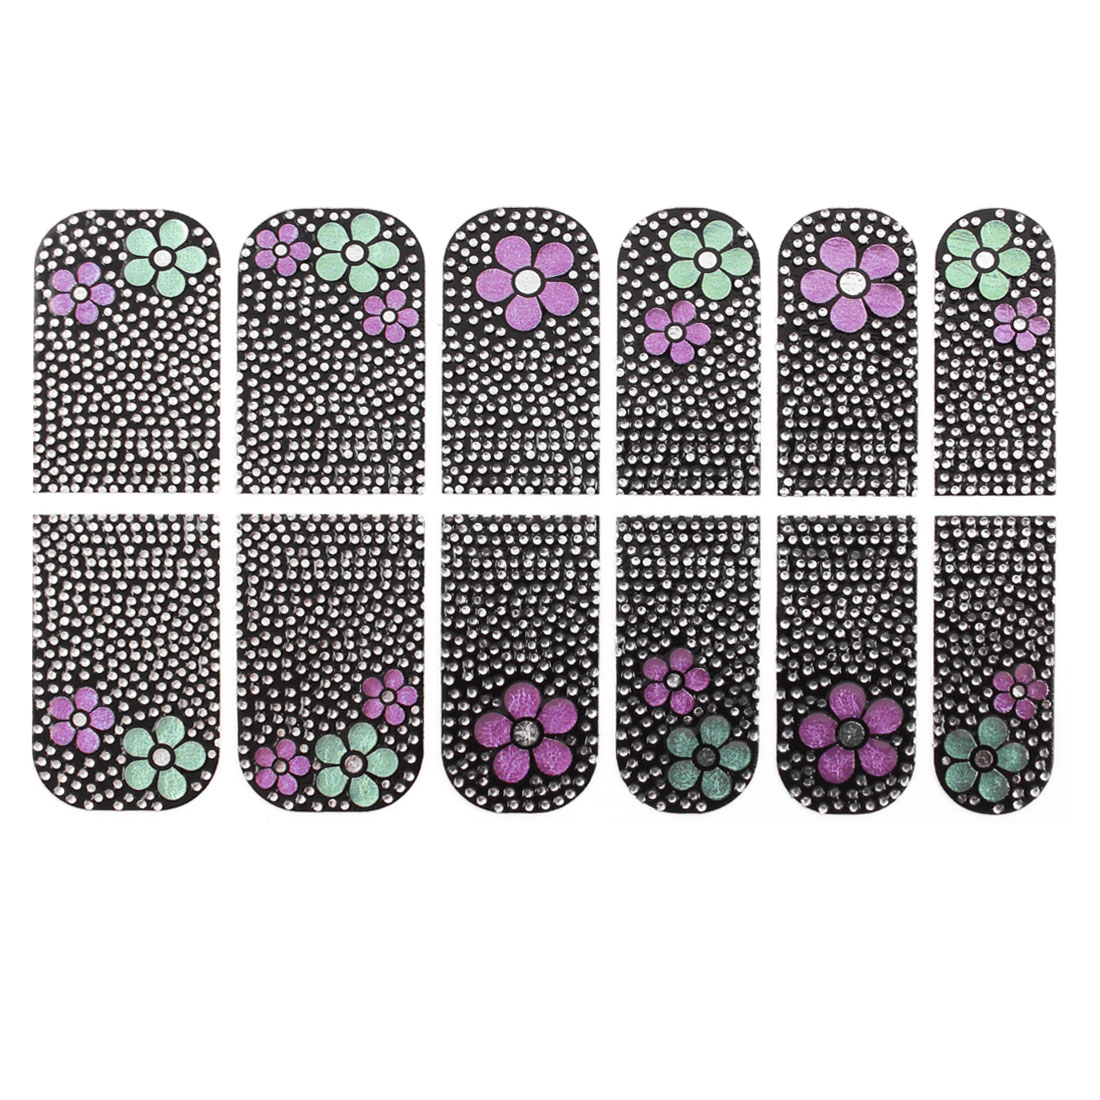 Silver Tone Dots Magenta Green Flower Prints Nail Foils 12 Pcs Black